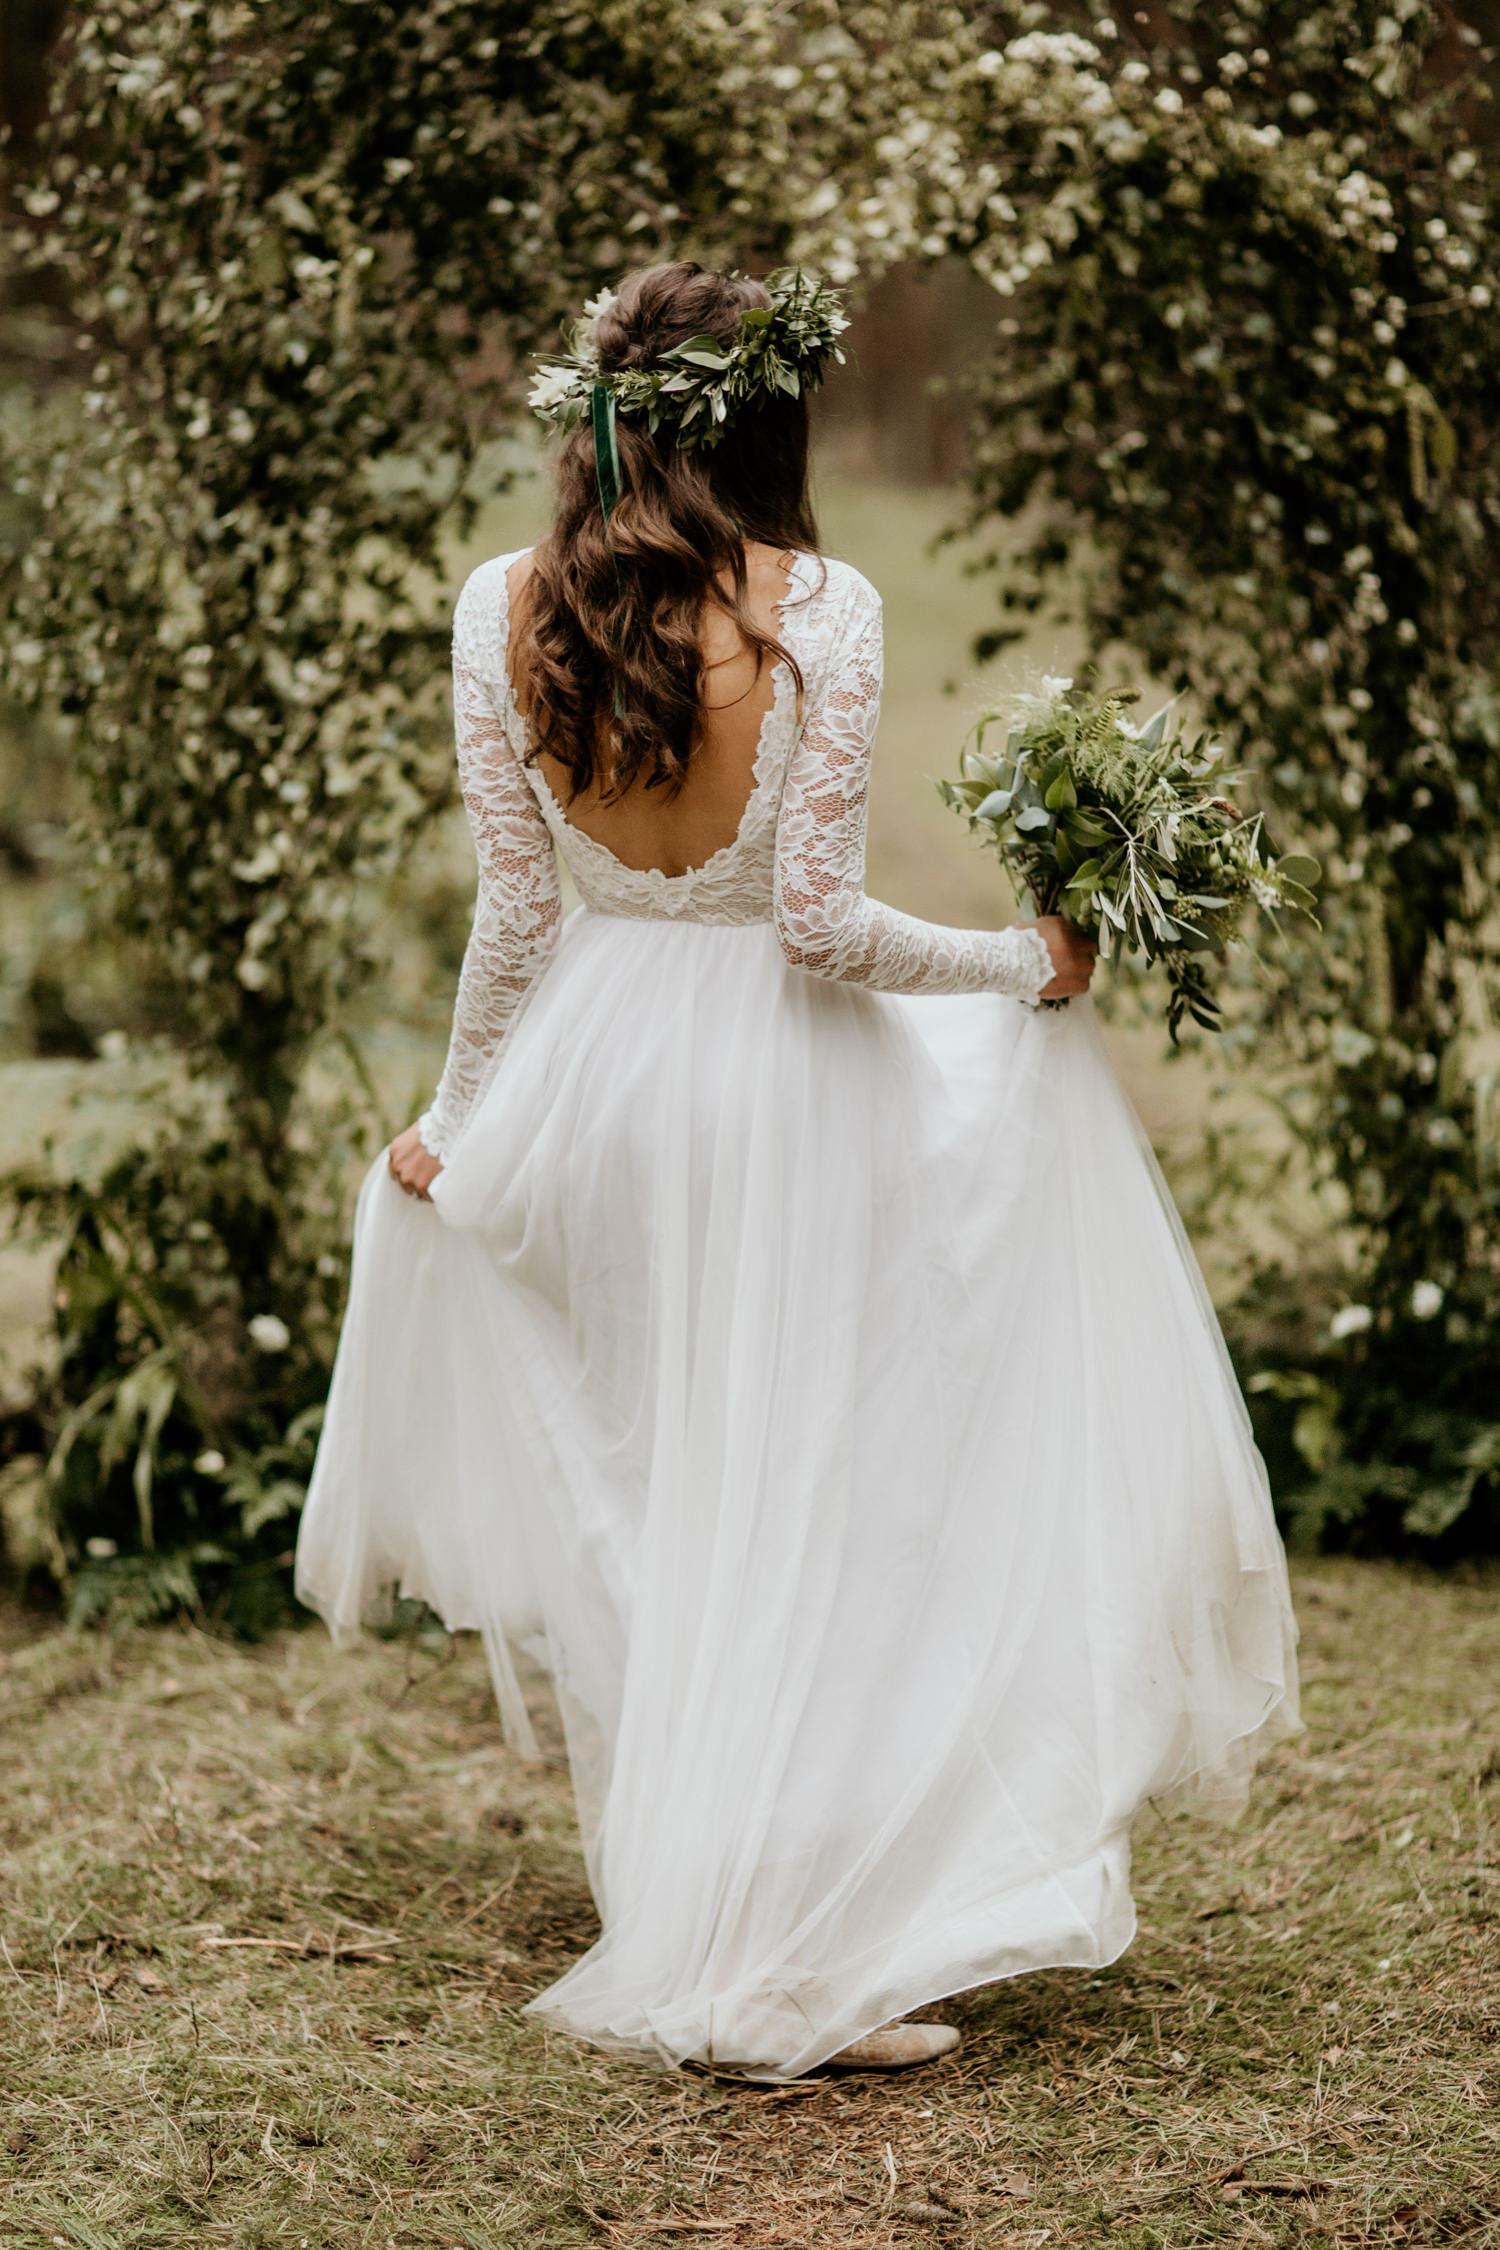 ethically made wedding dress